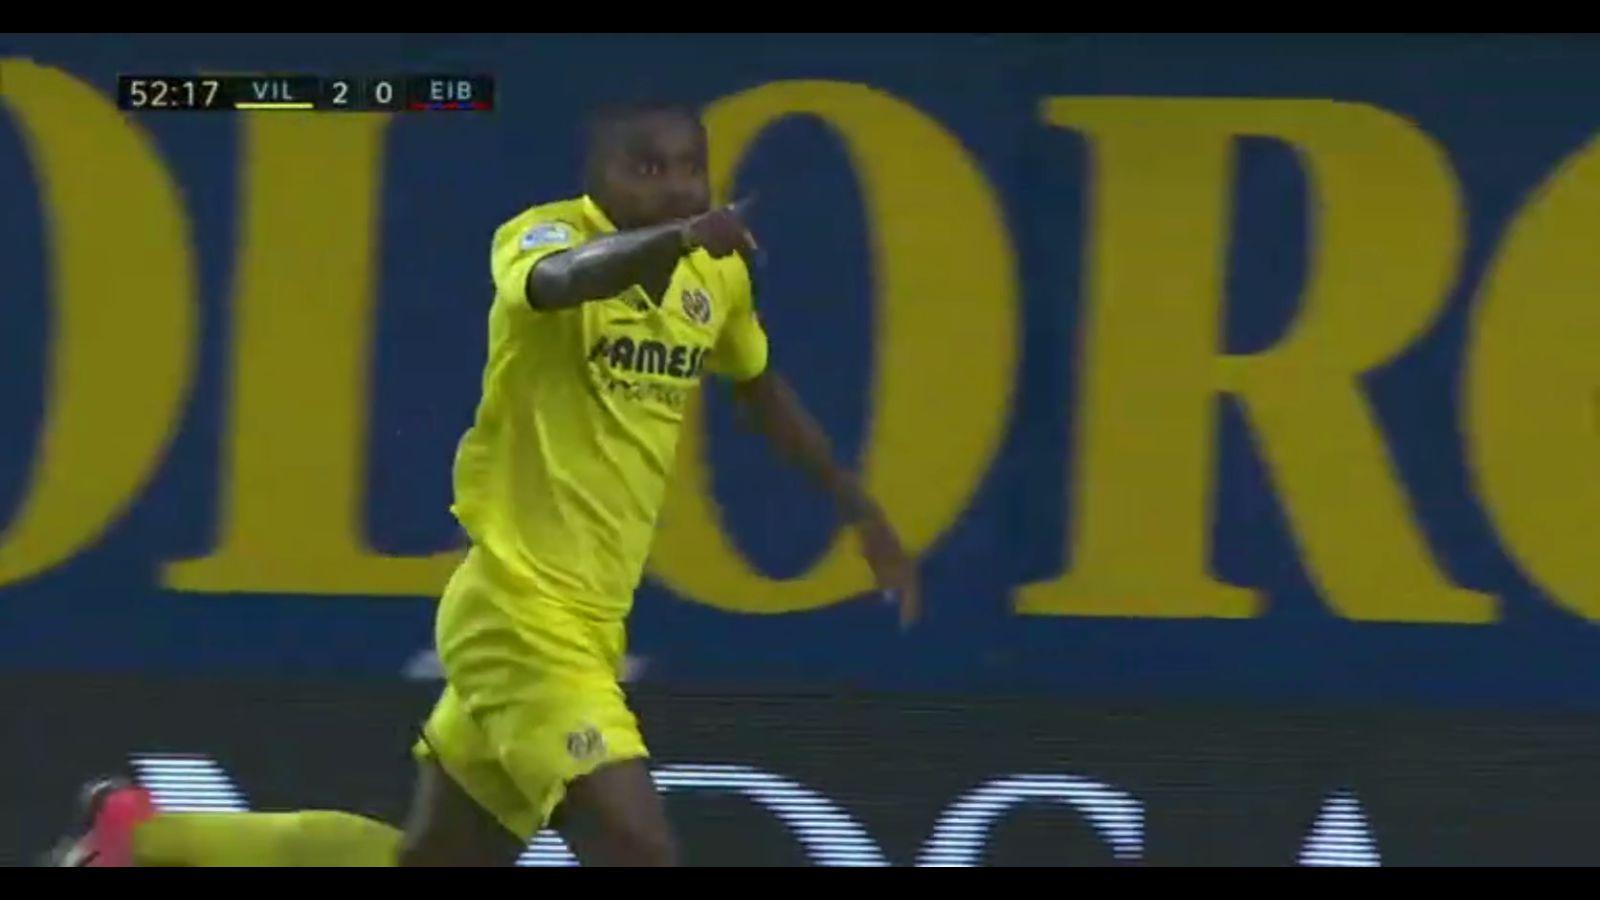 01-10-2017 - Villarreal 3-0 Eibar